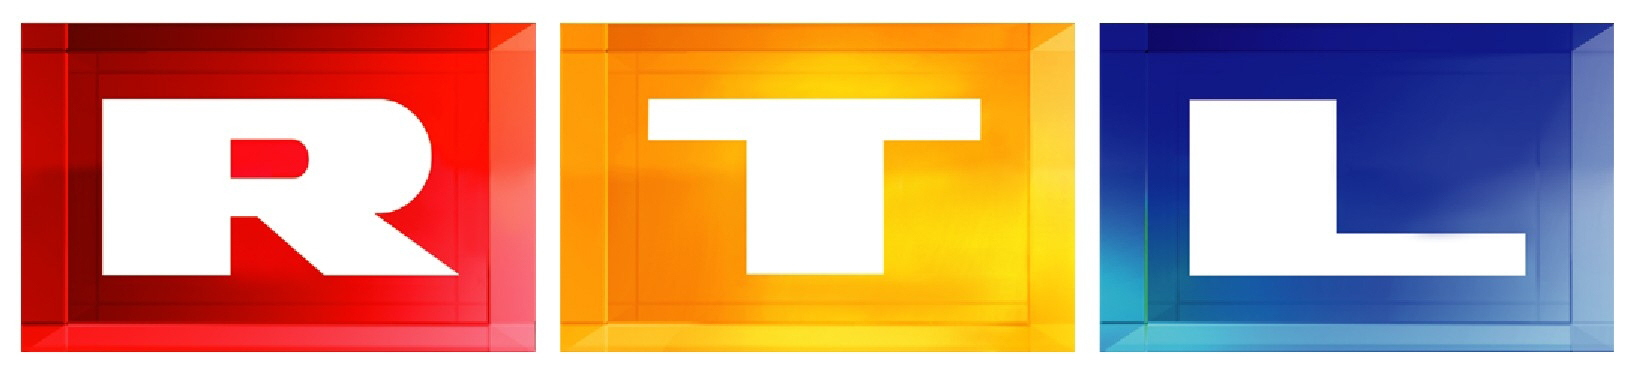 RTL LOGO(1) - RTL Television